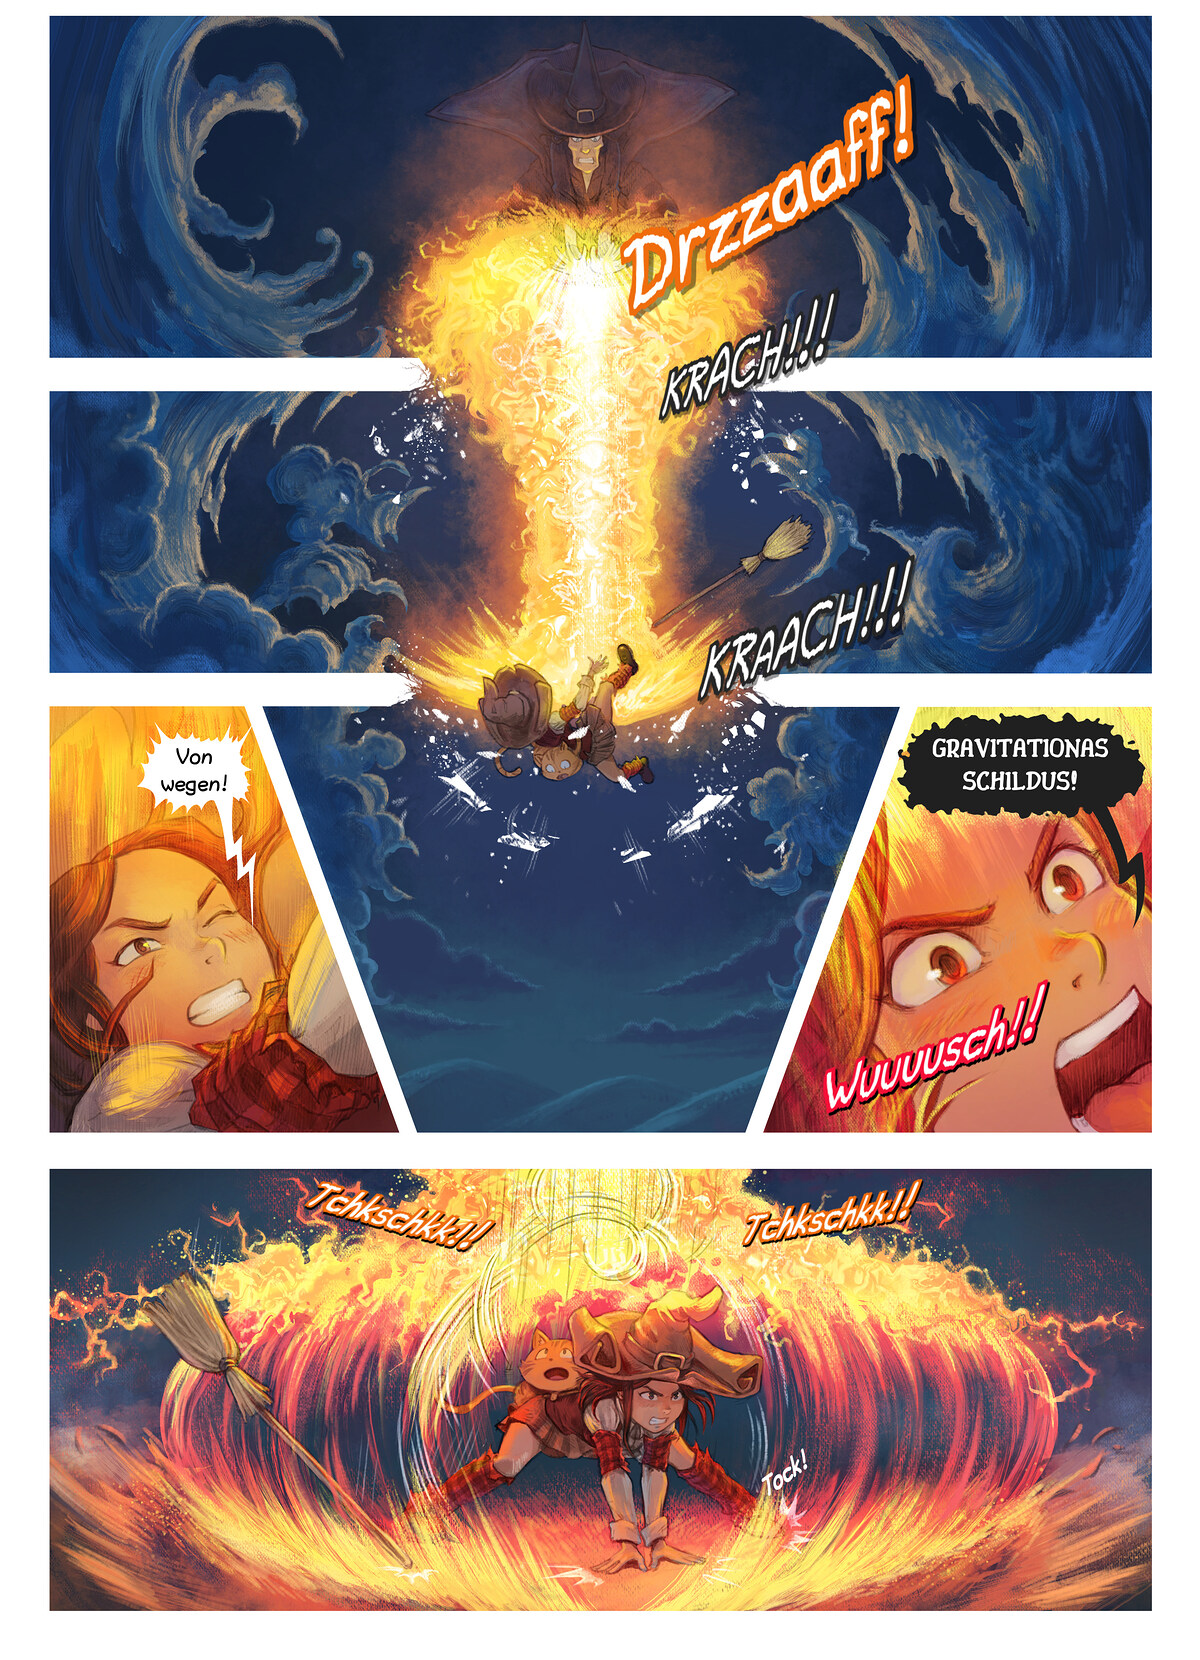 Episode 31: Der Kampf, Page 2